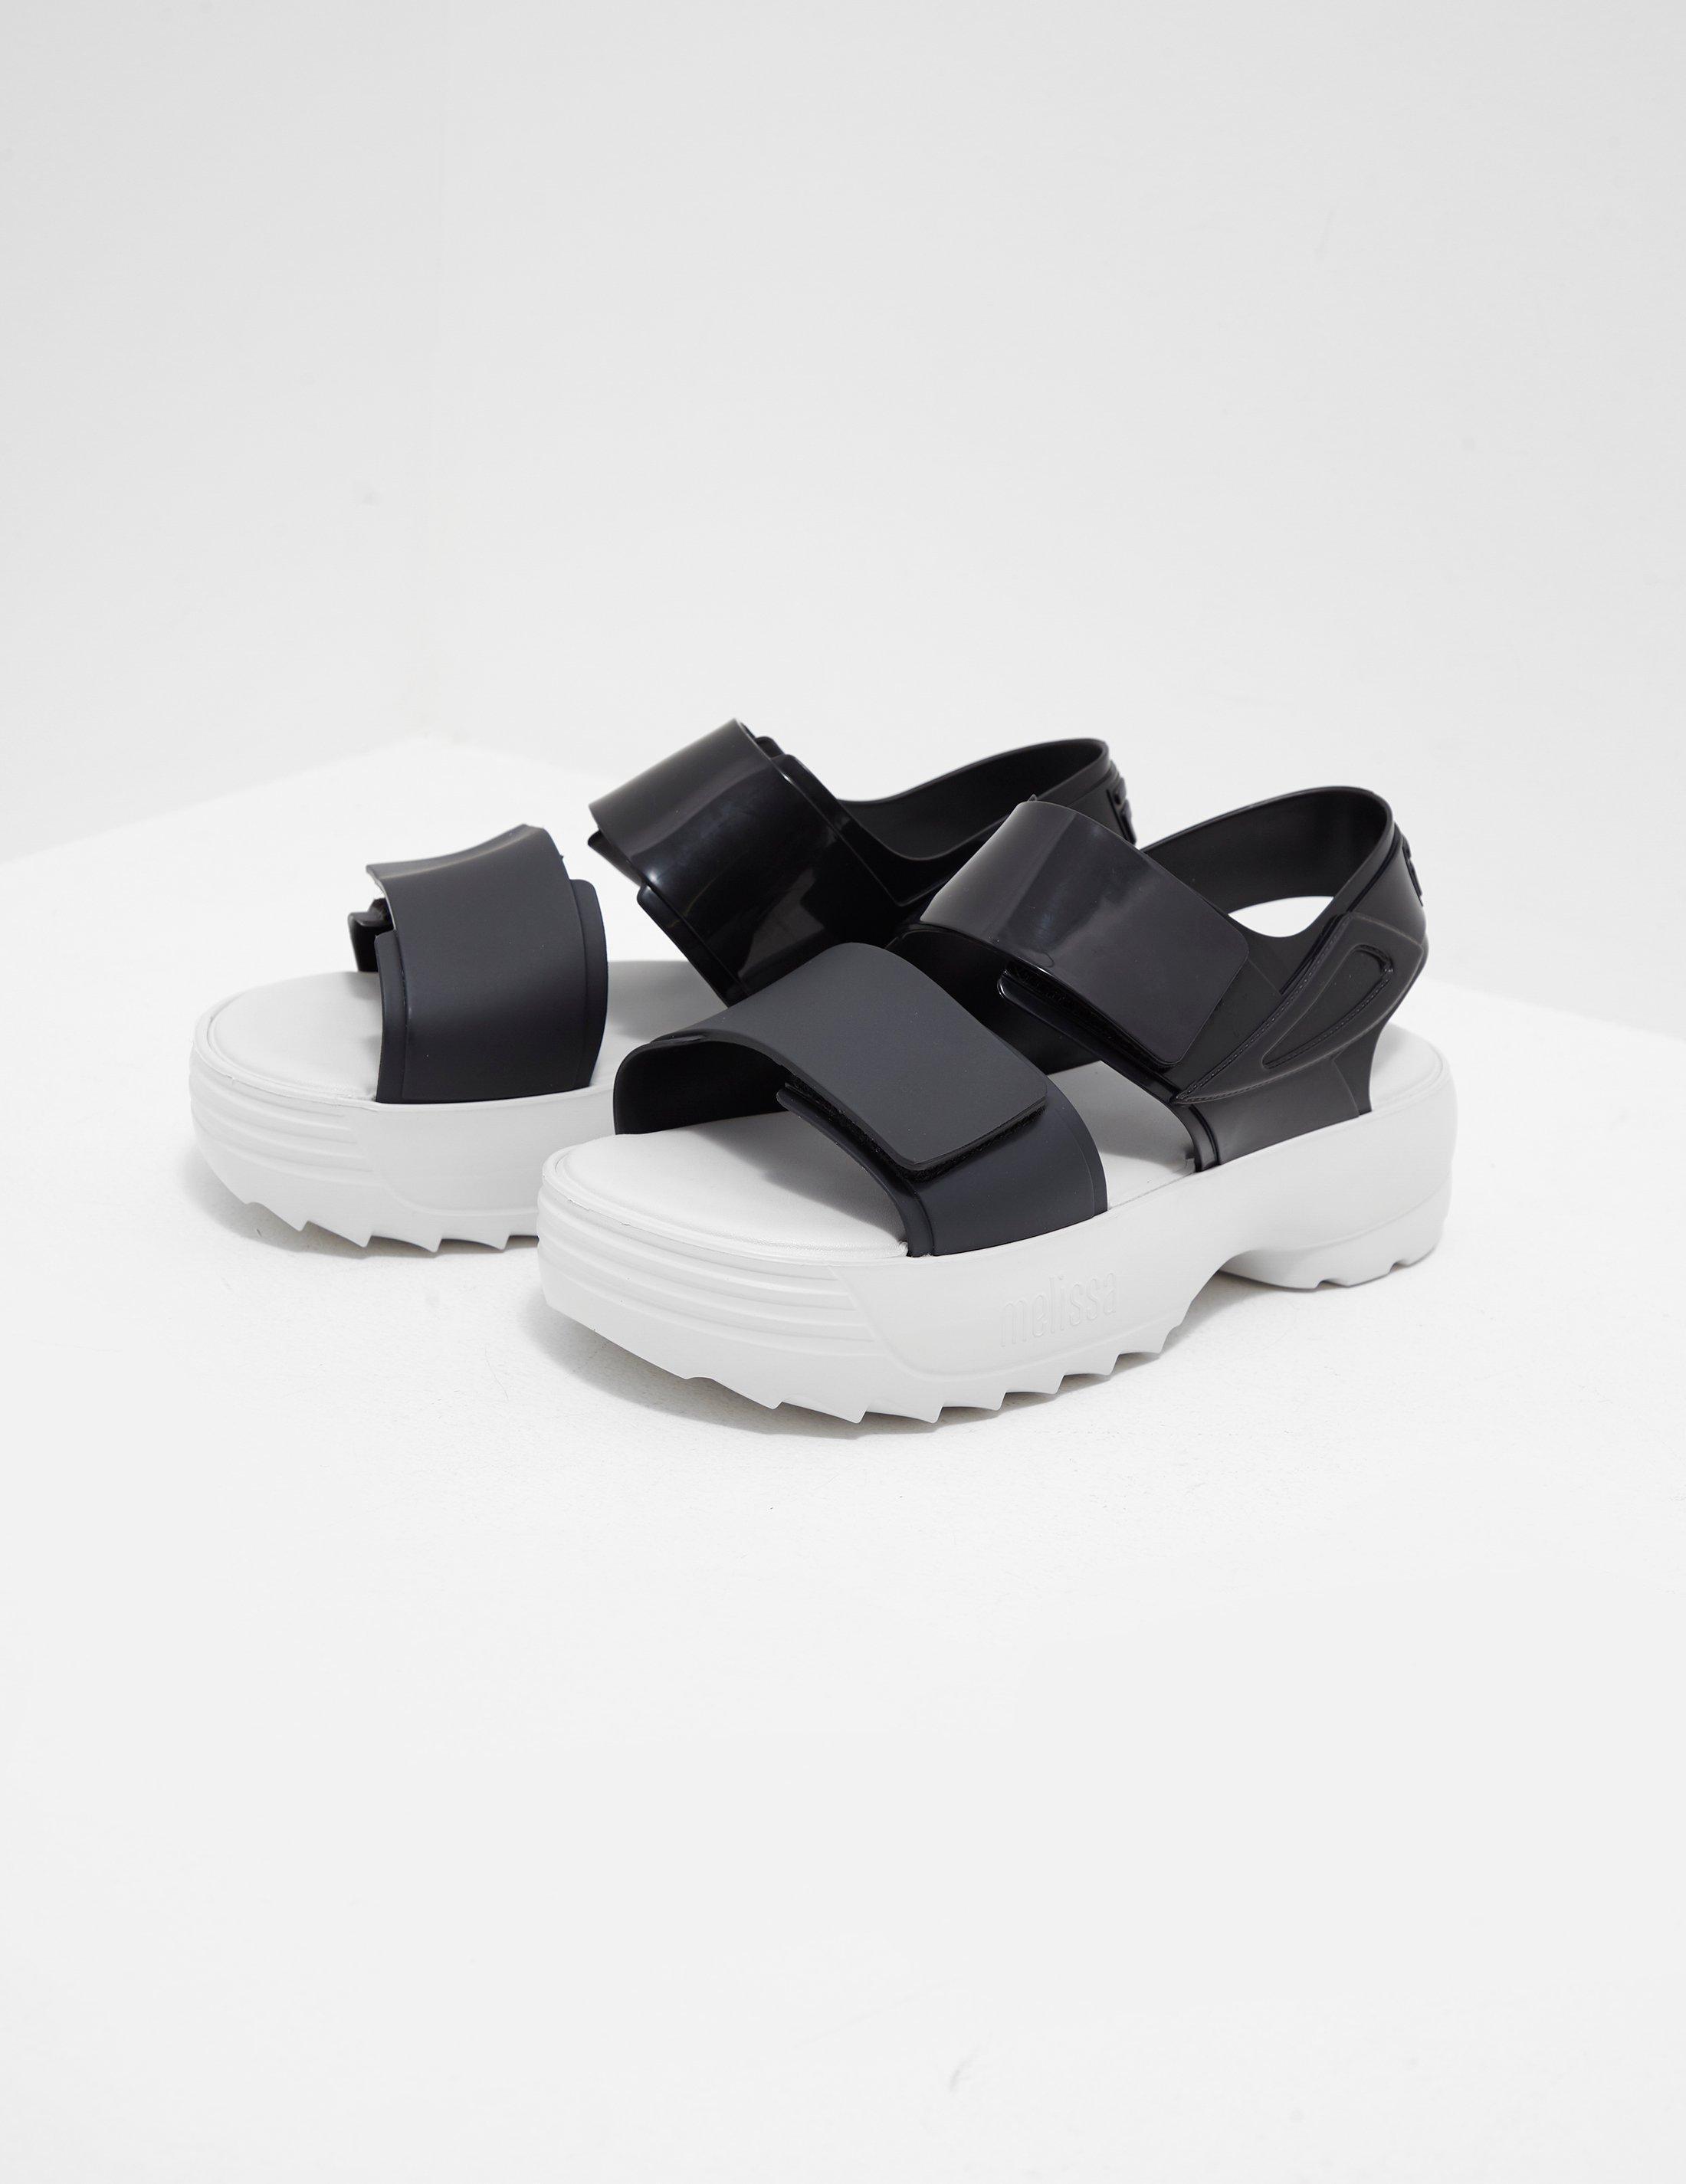 963a8c9add68 Melissa X Fila Sandals Black in Black - Lyst